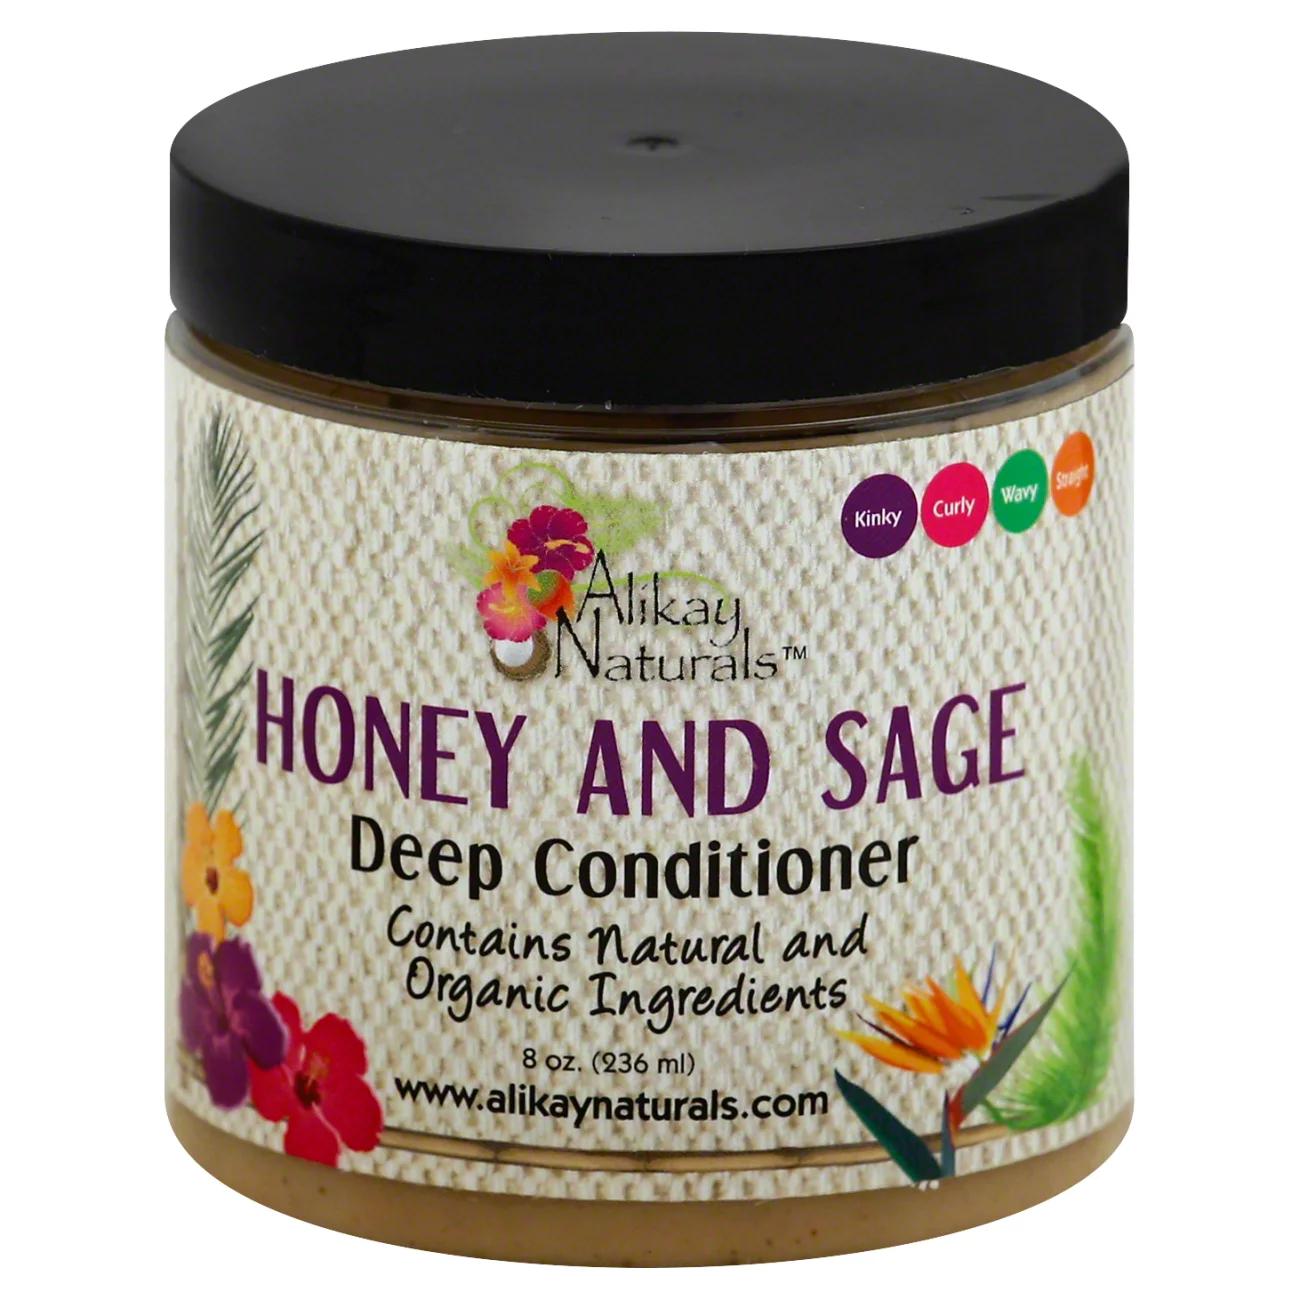 Alikay Naturals Honey and Sage Deep Conditioner 8oz